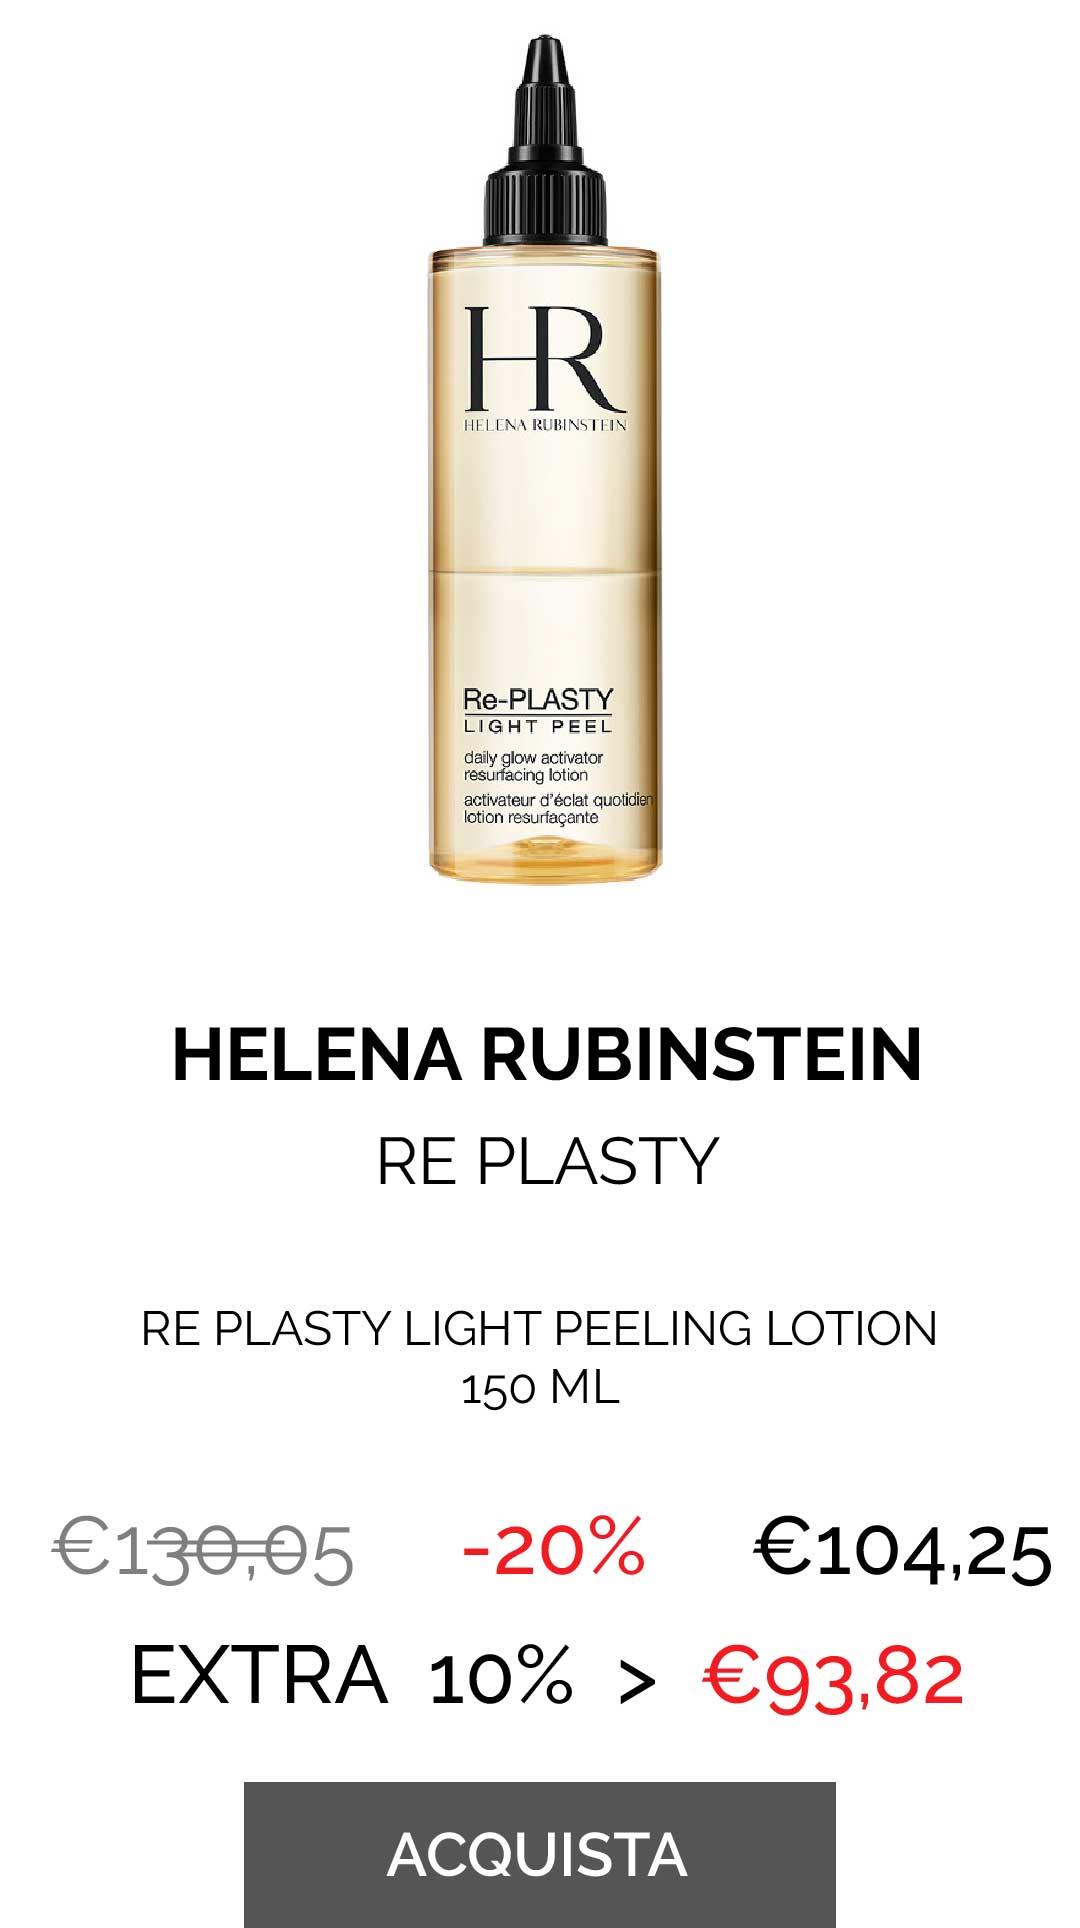 RE PLASTY LIGHT PEELING LOTION 150 ML